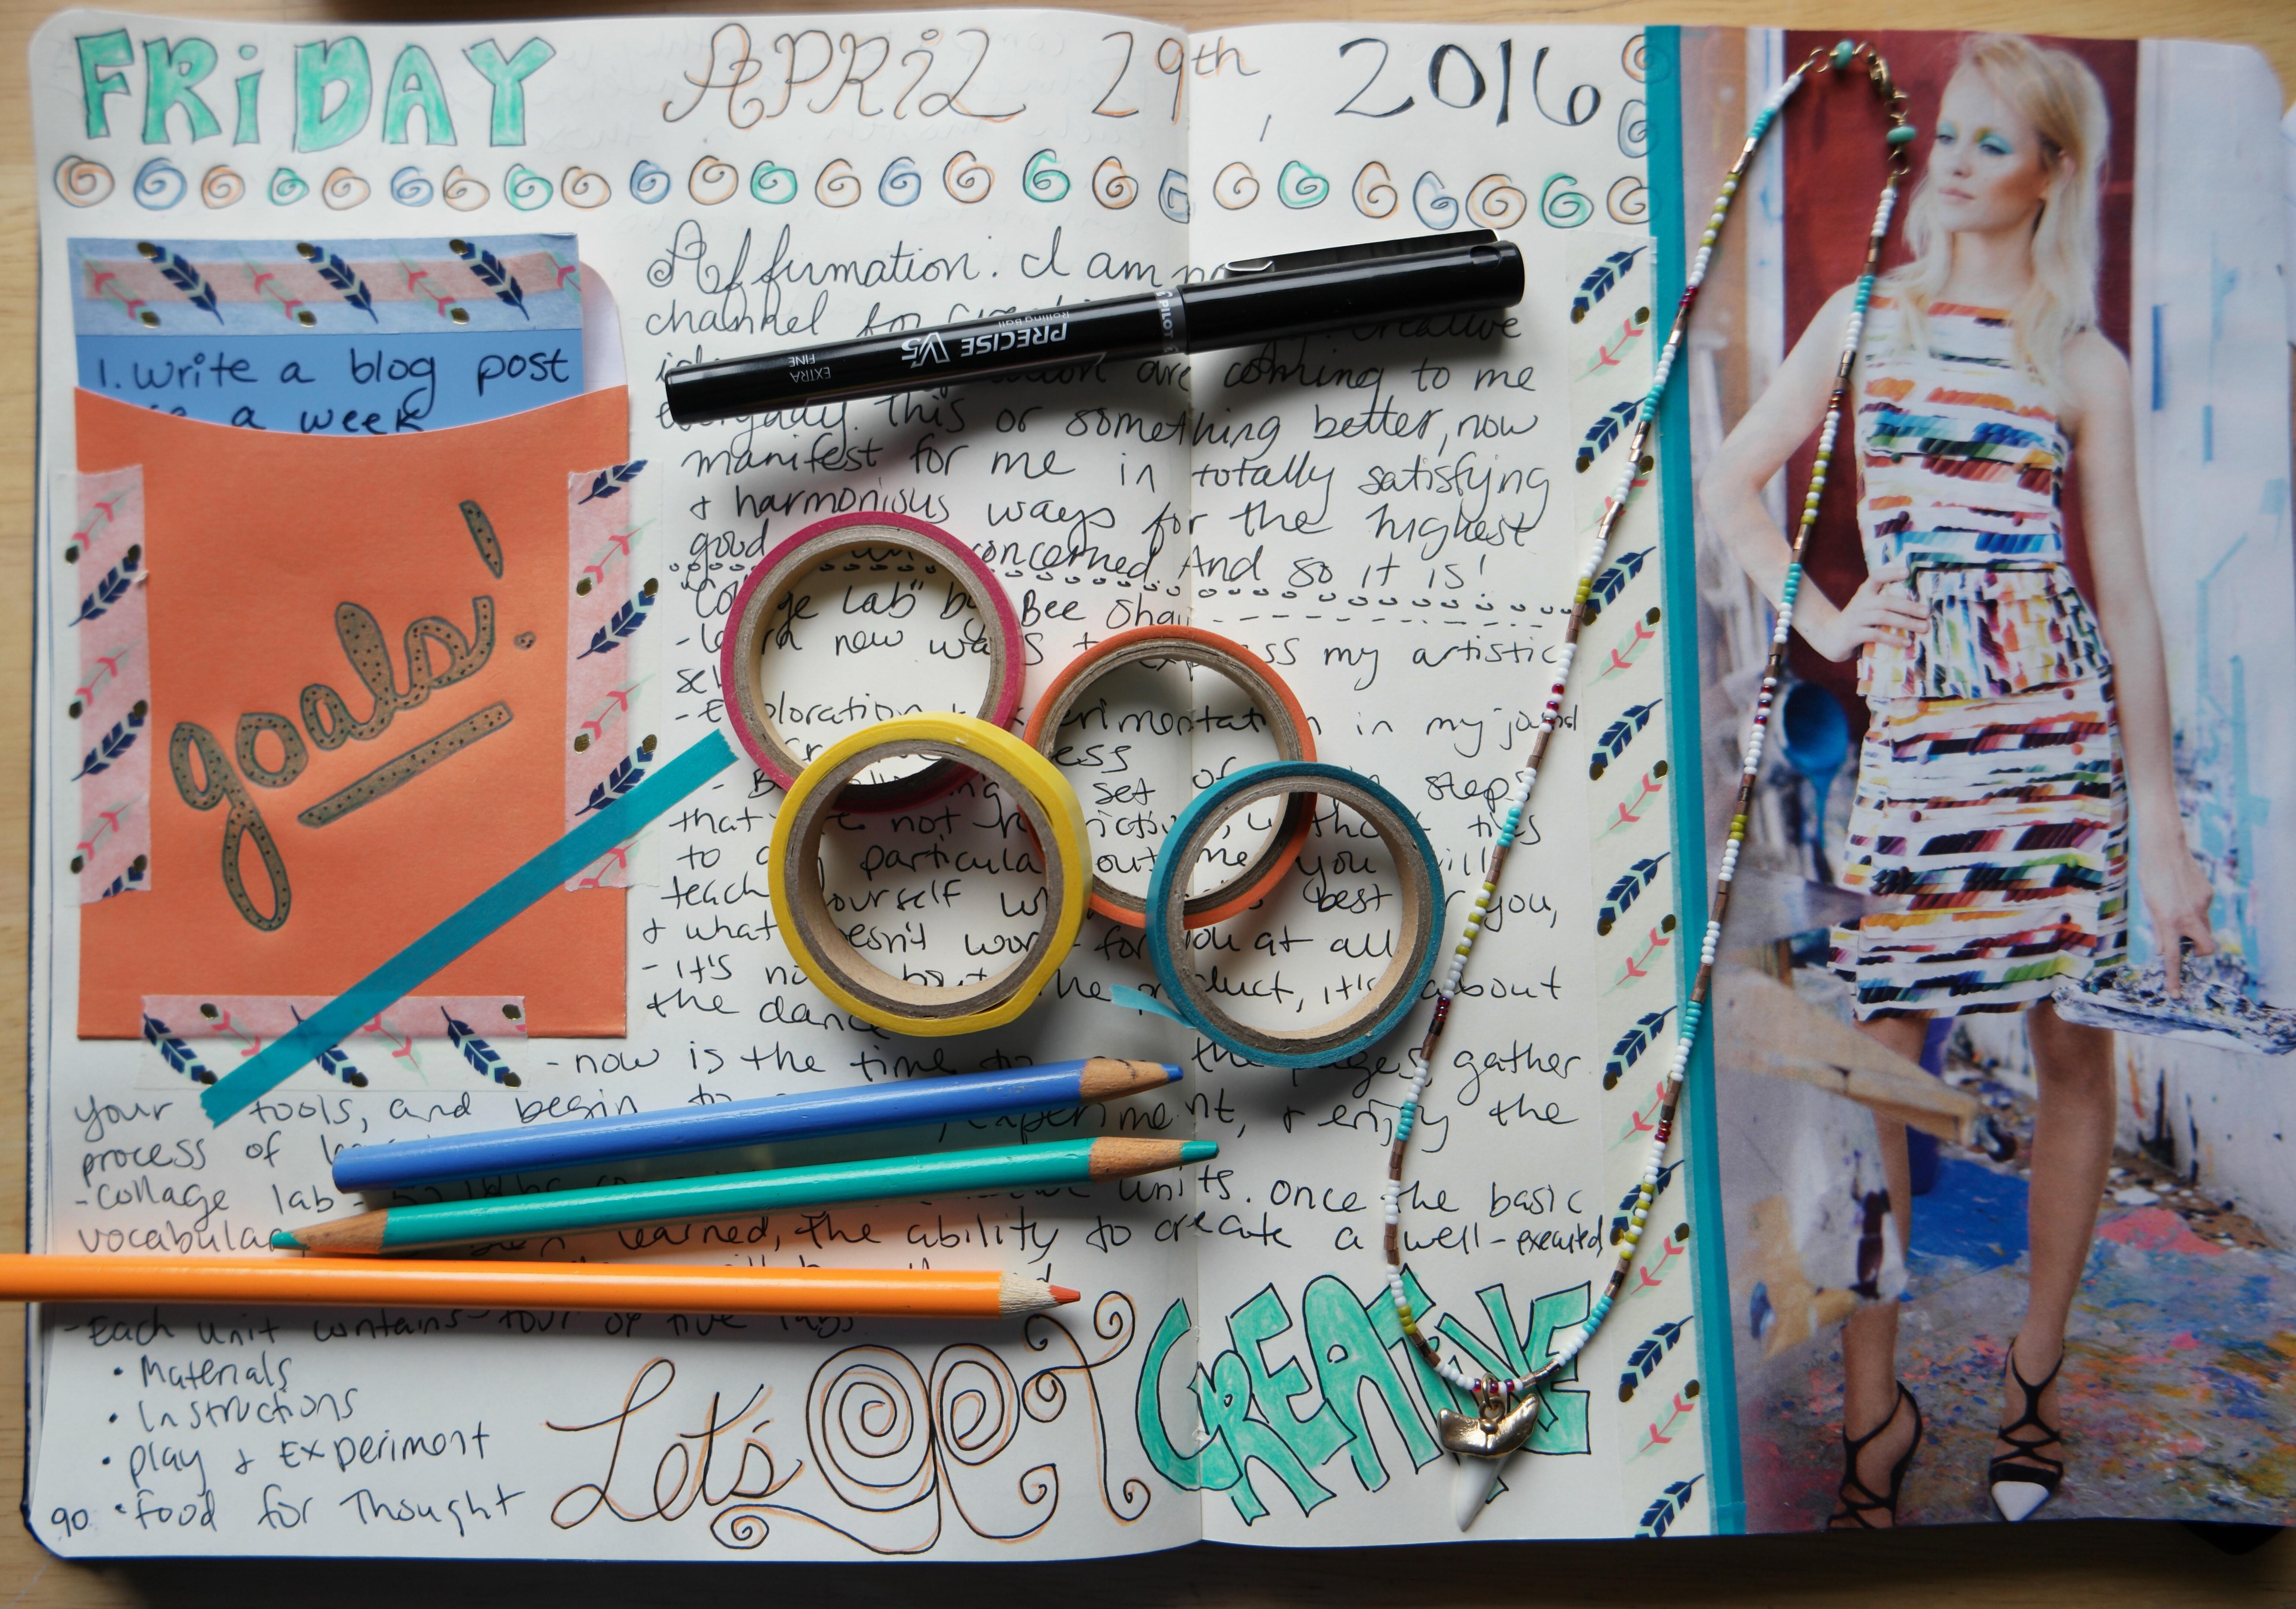 Creative journaling. Creative goal-setting. Visual journal.